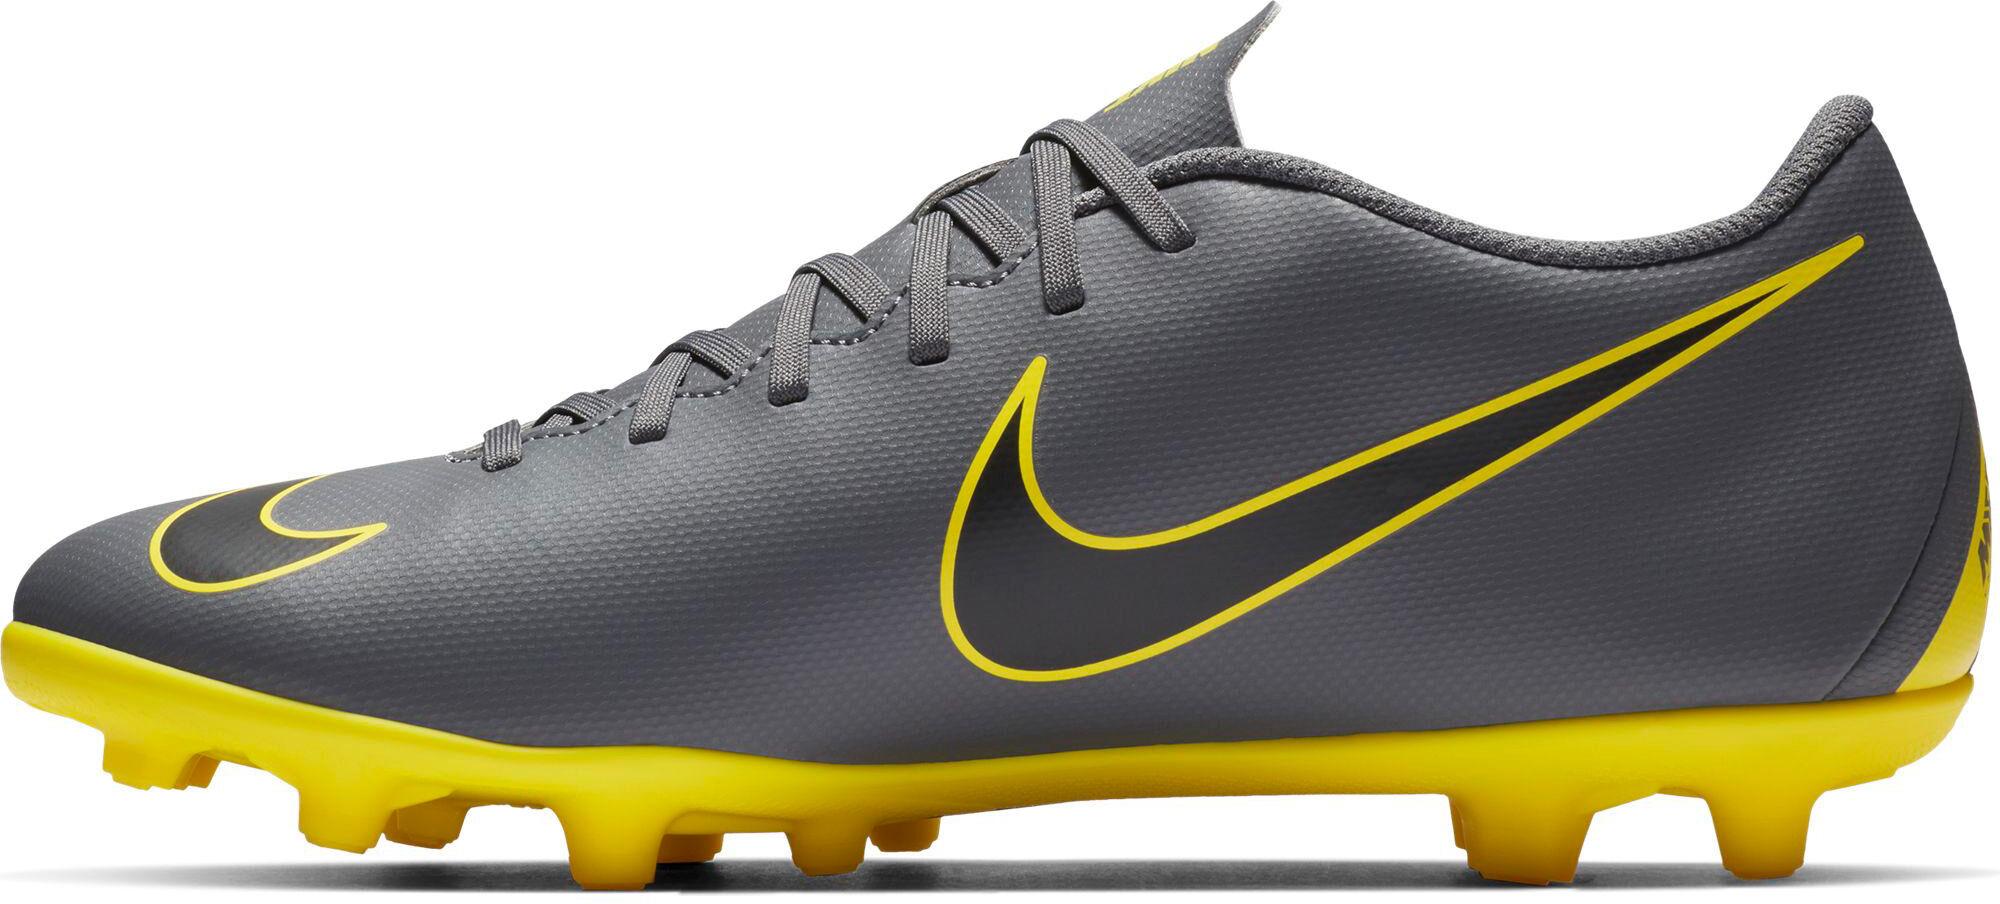 Nike | Vapor 12 Club GS FGMG felnőtt stoplis focicipő